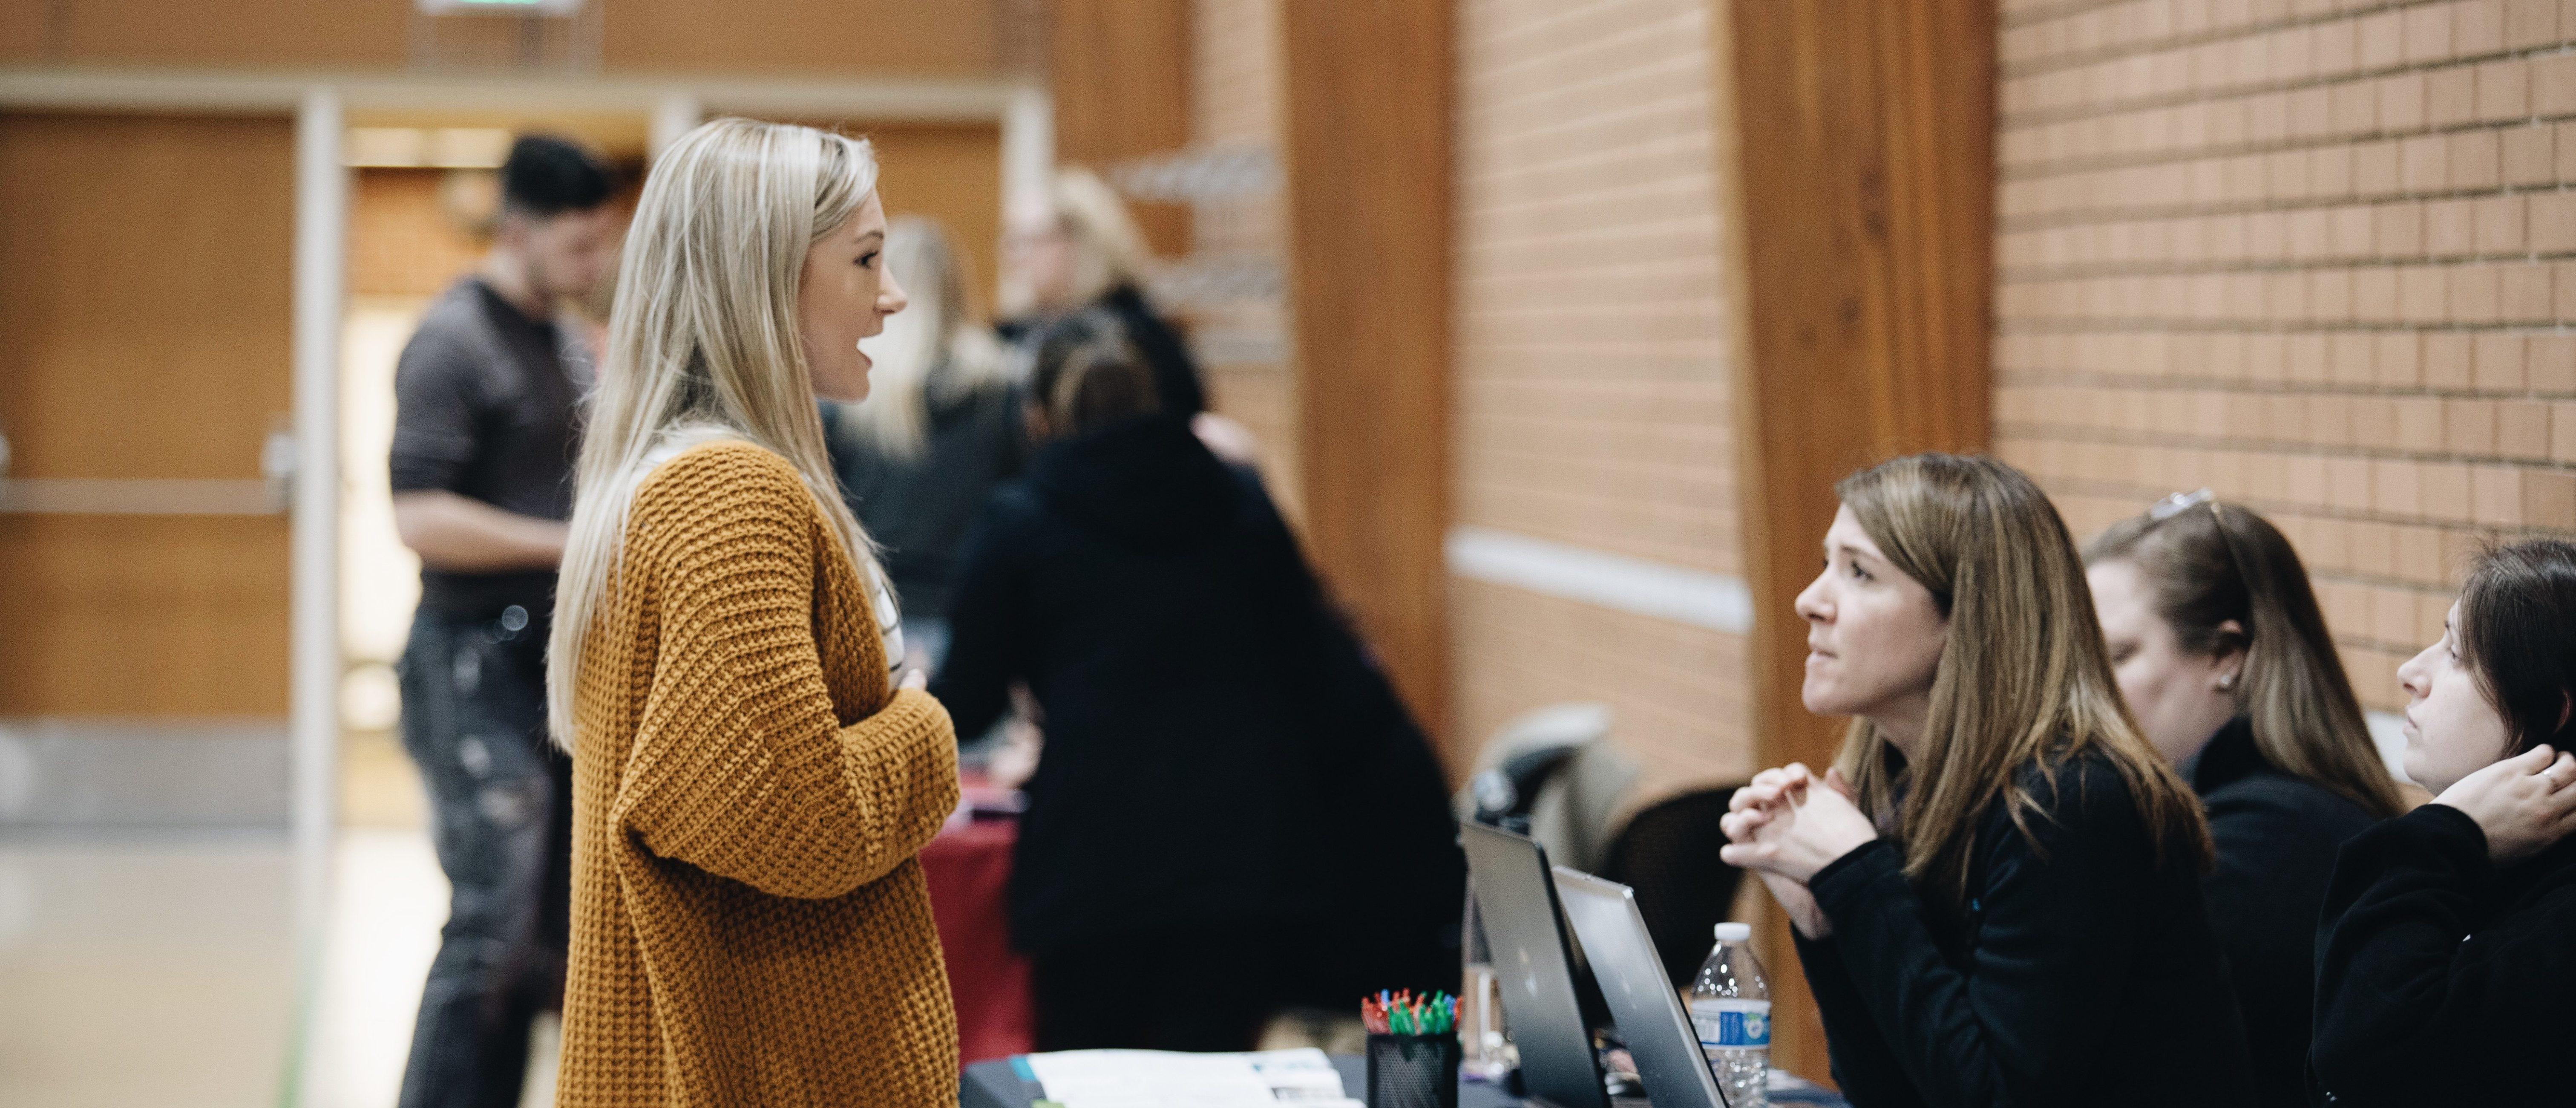 Kettering College Breaks Summer Enrollment Record